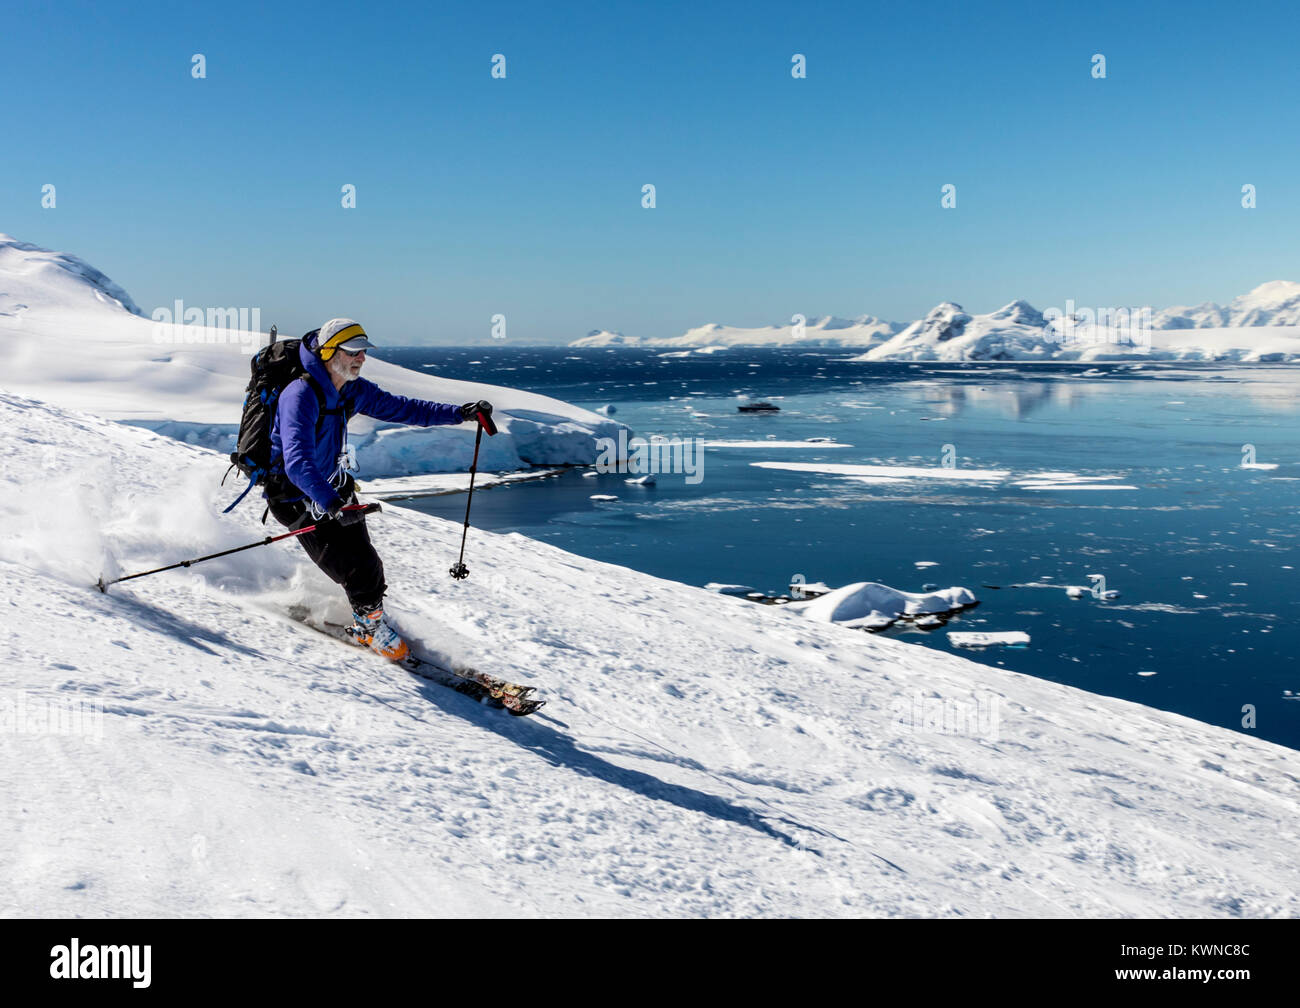 Alpine ski mountaineers skiing downhill; Nansen Island; Antarctica - Stock Image